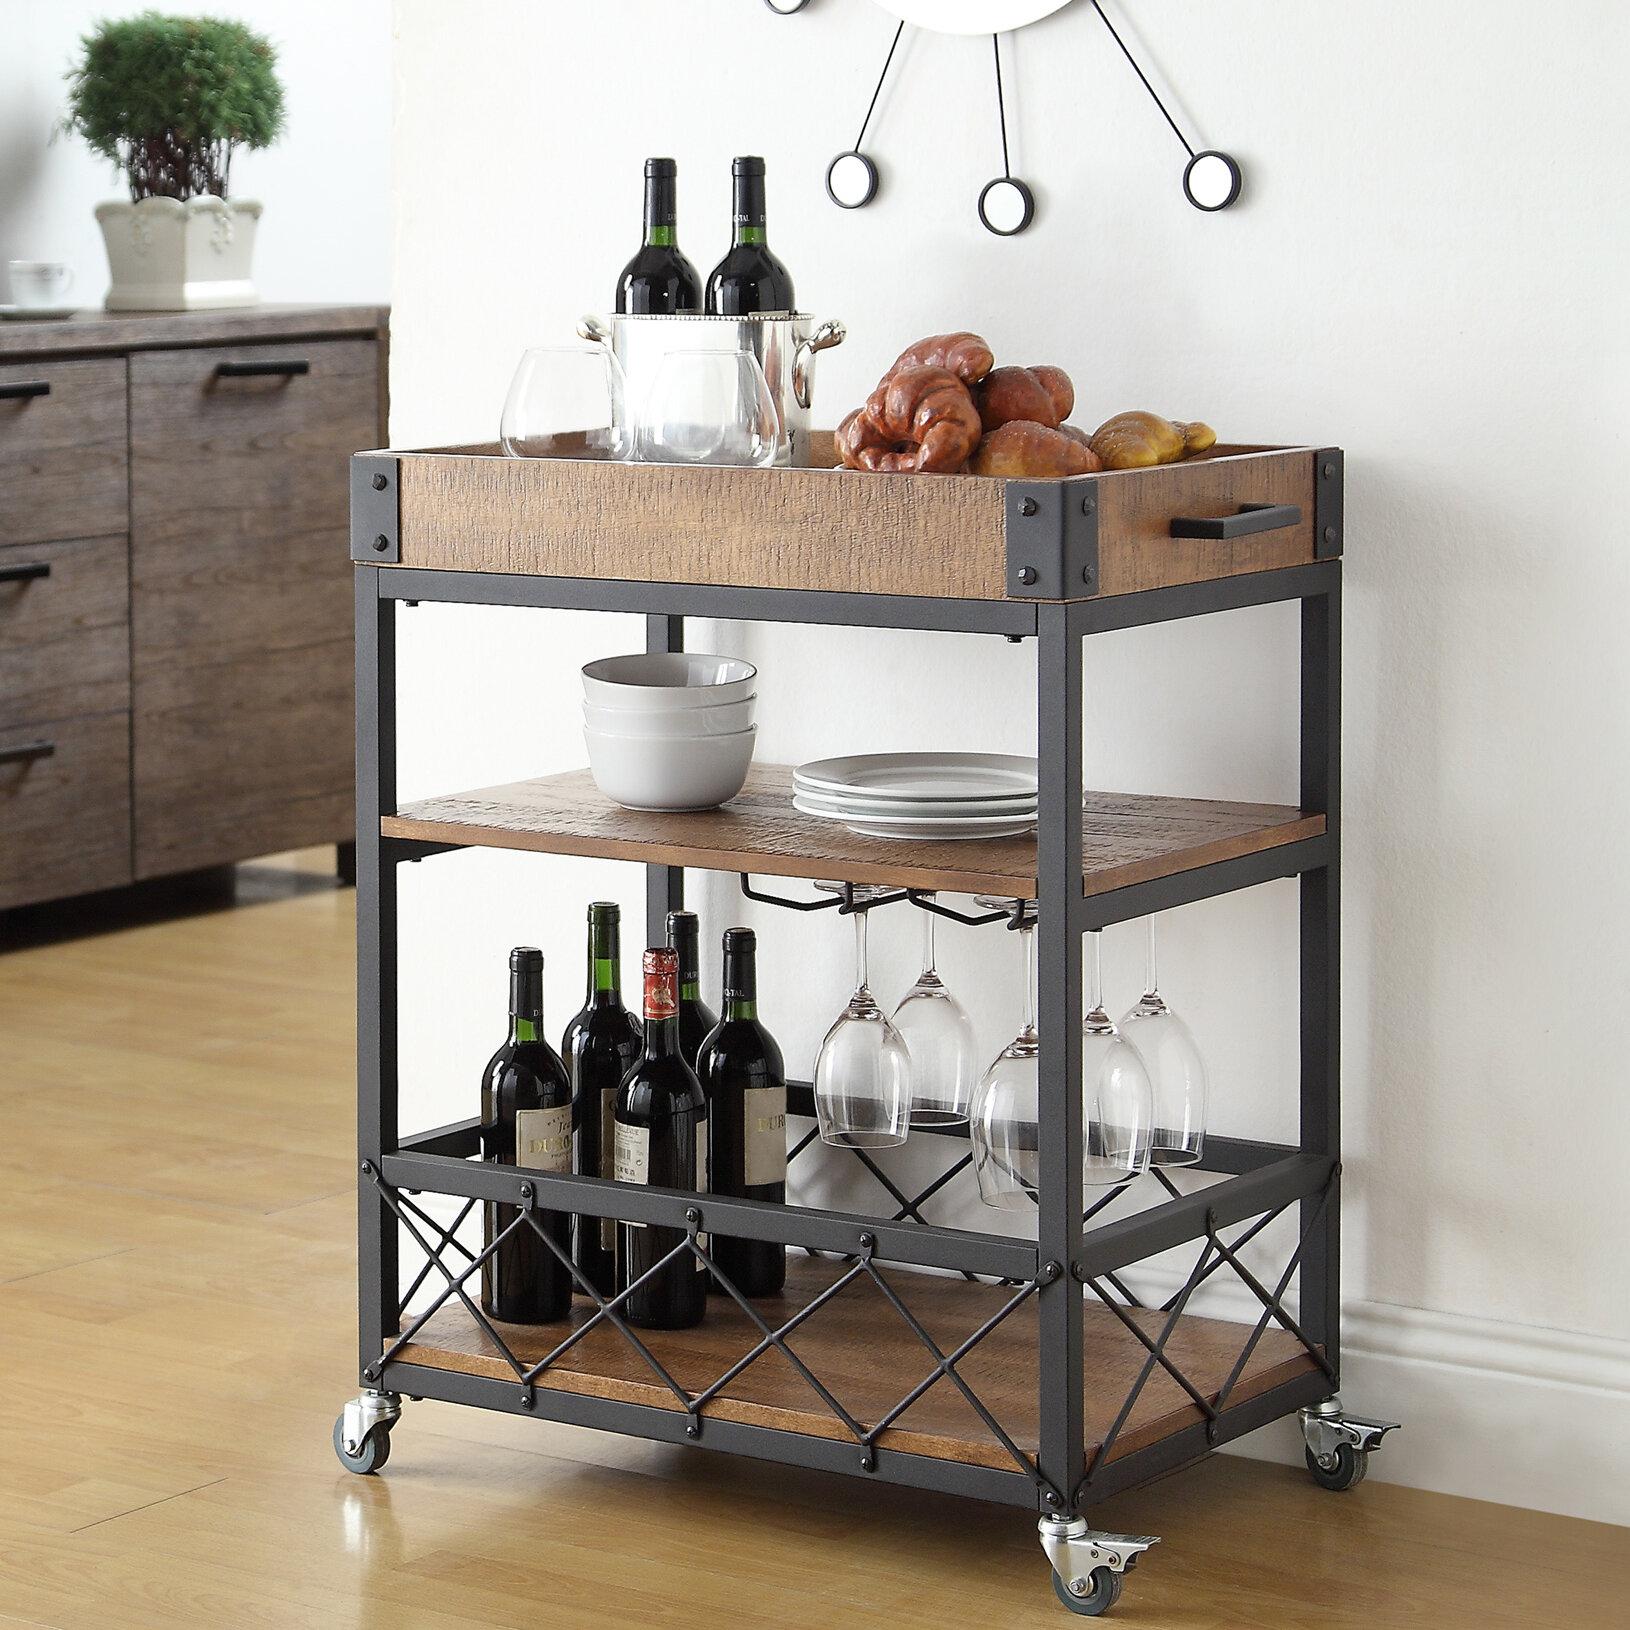 zona kitchen cart - Kitchen Carts